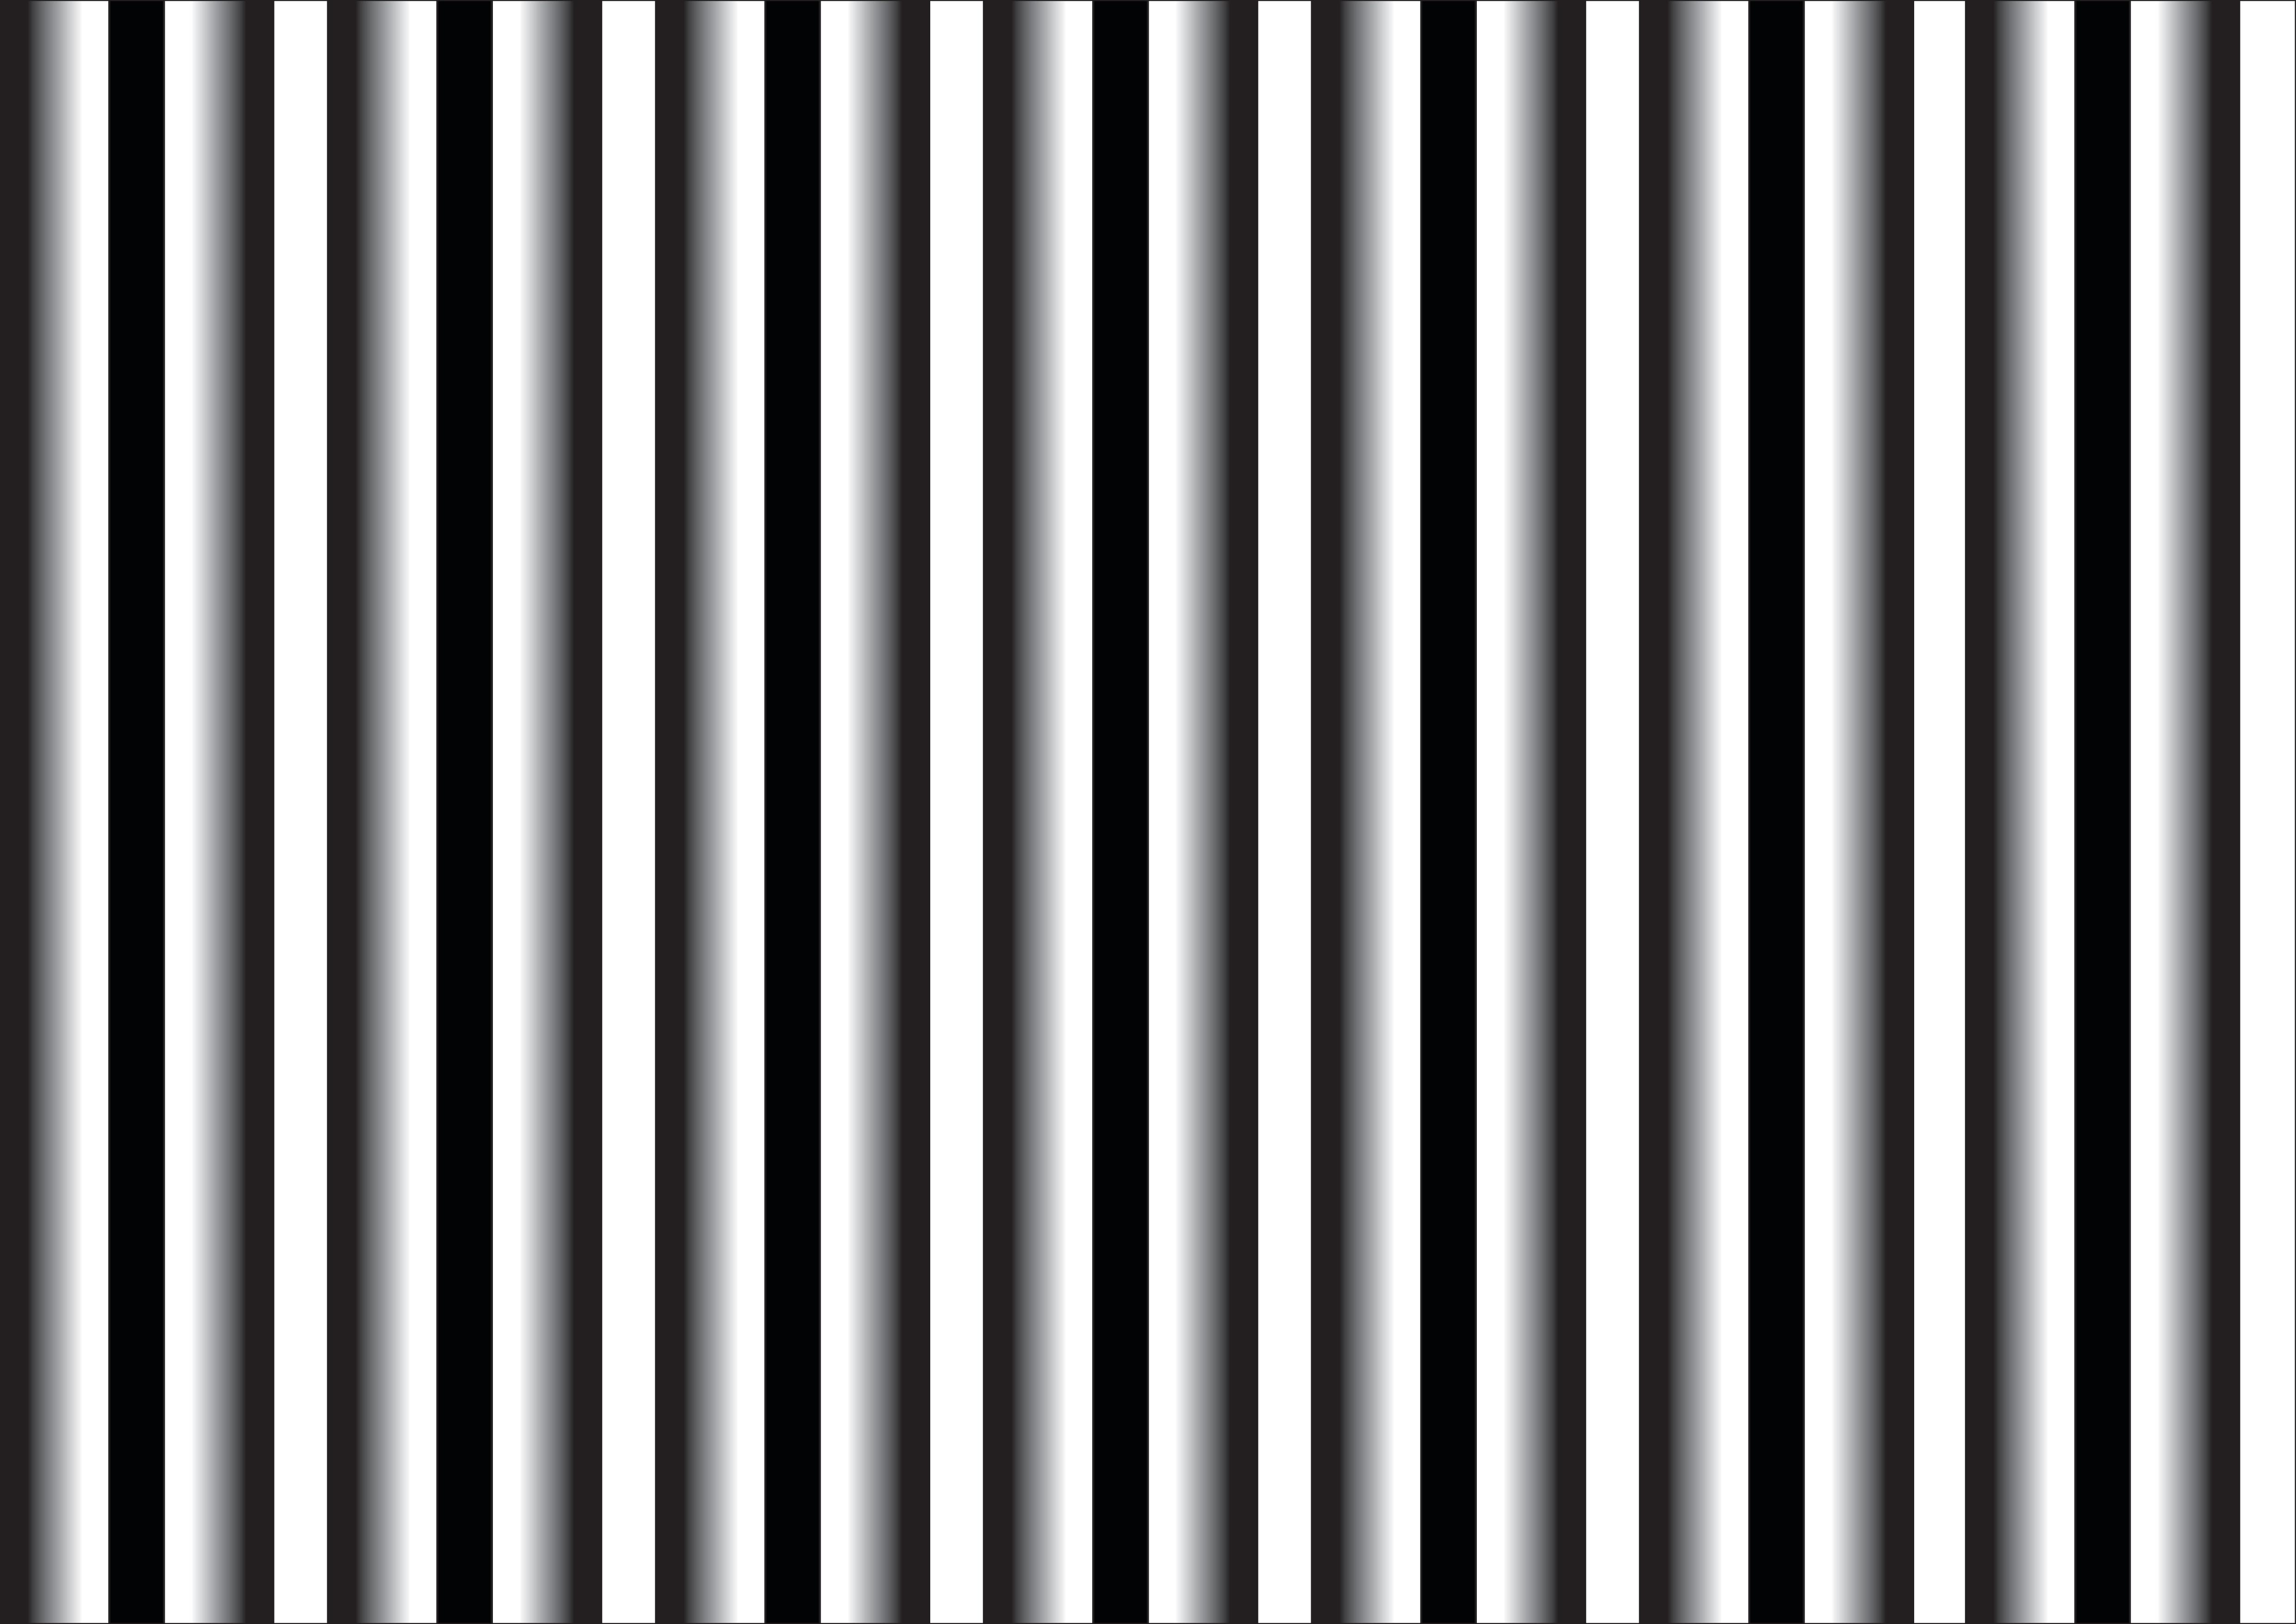 Stripe 12-01